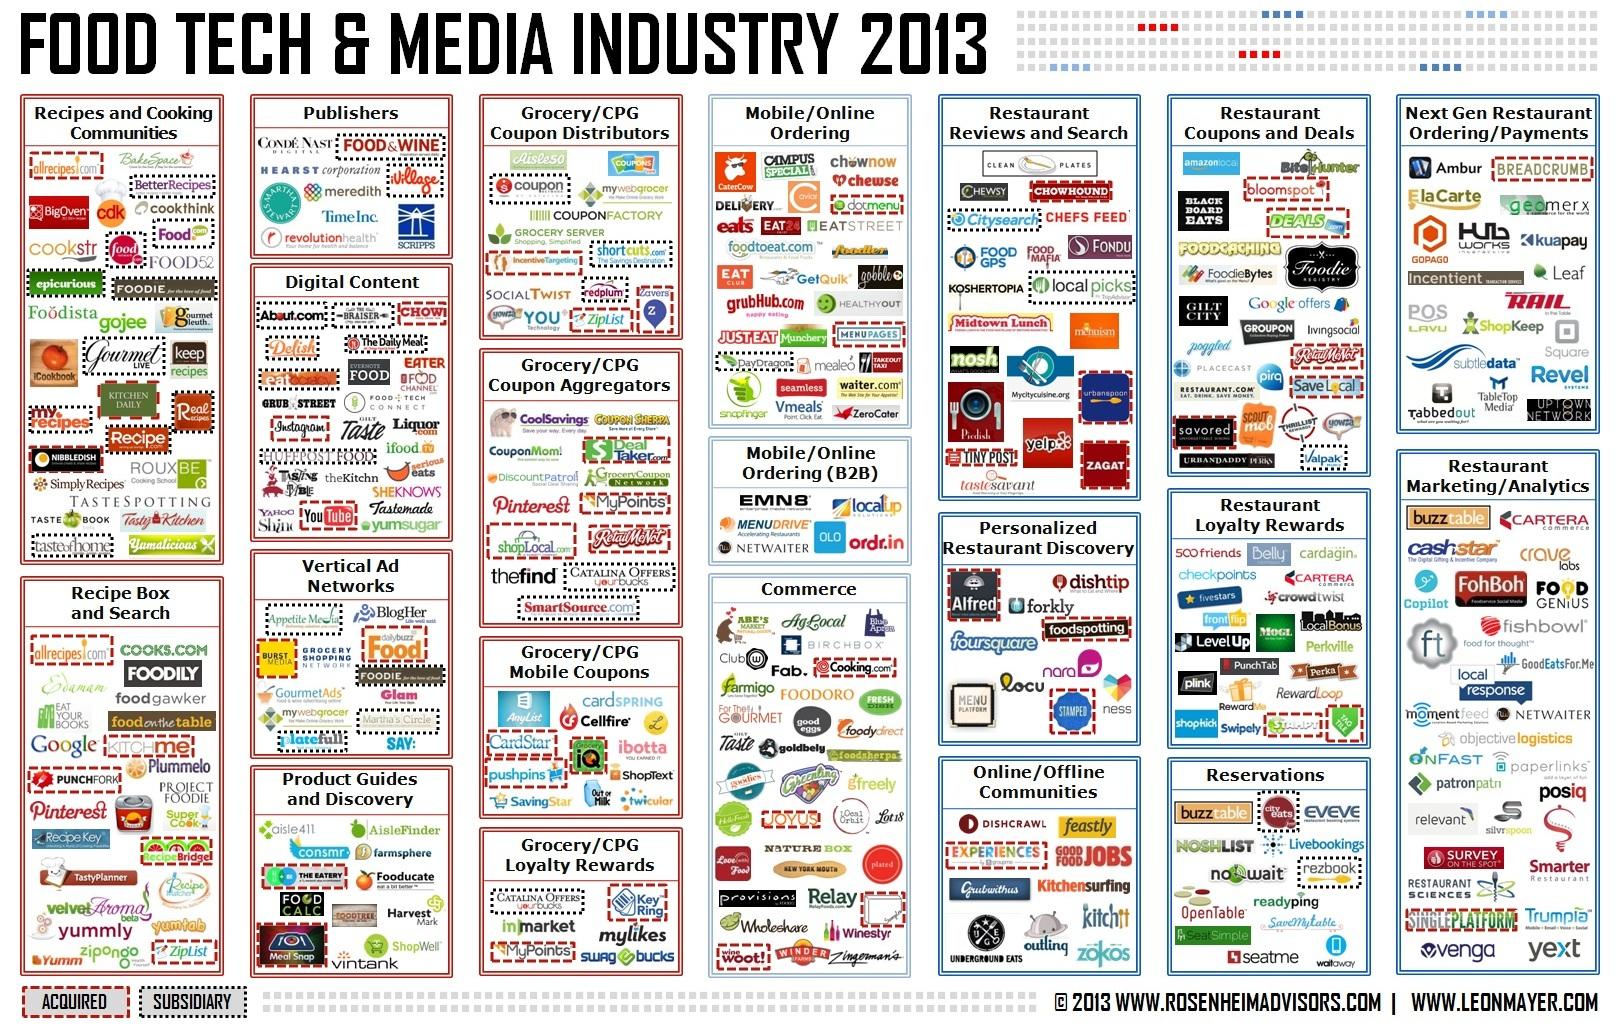 Food Tech & Media Industry Map - Rosenheim Advisors & Leon Mayer